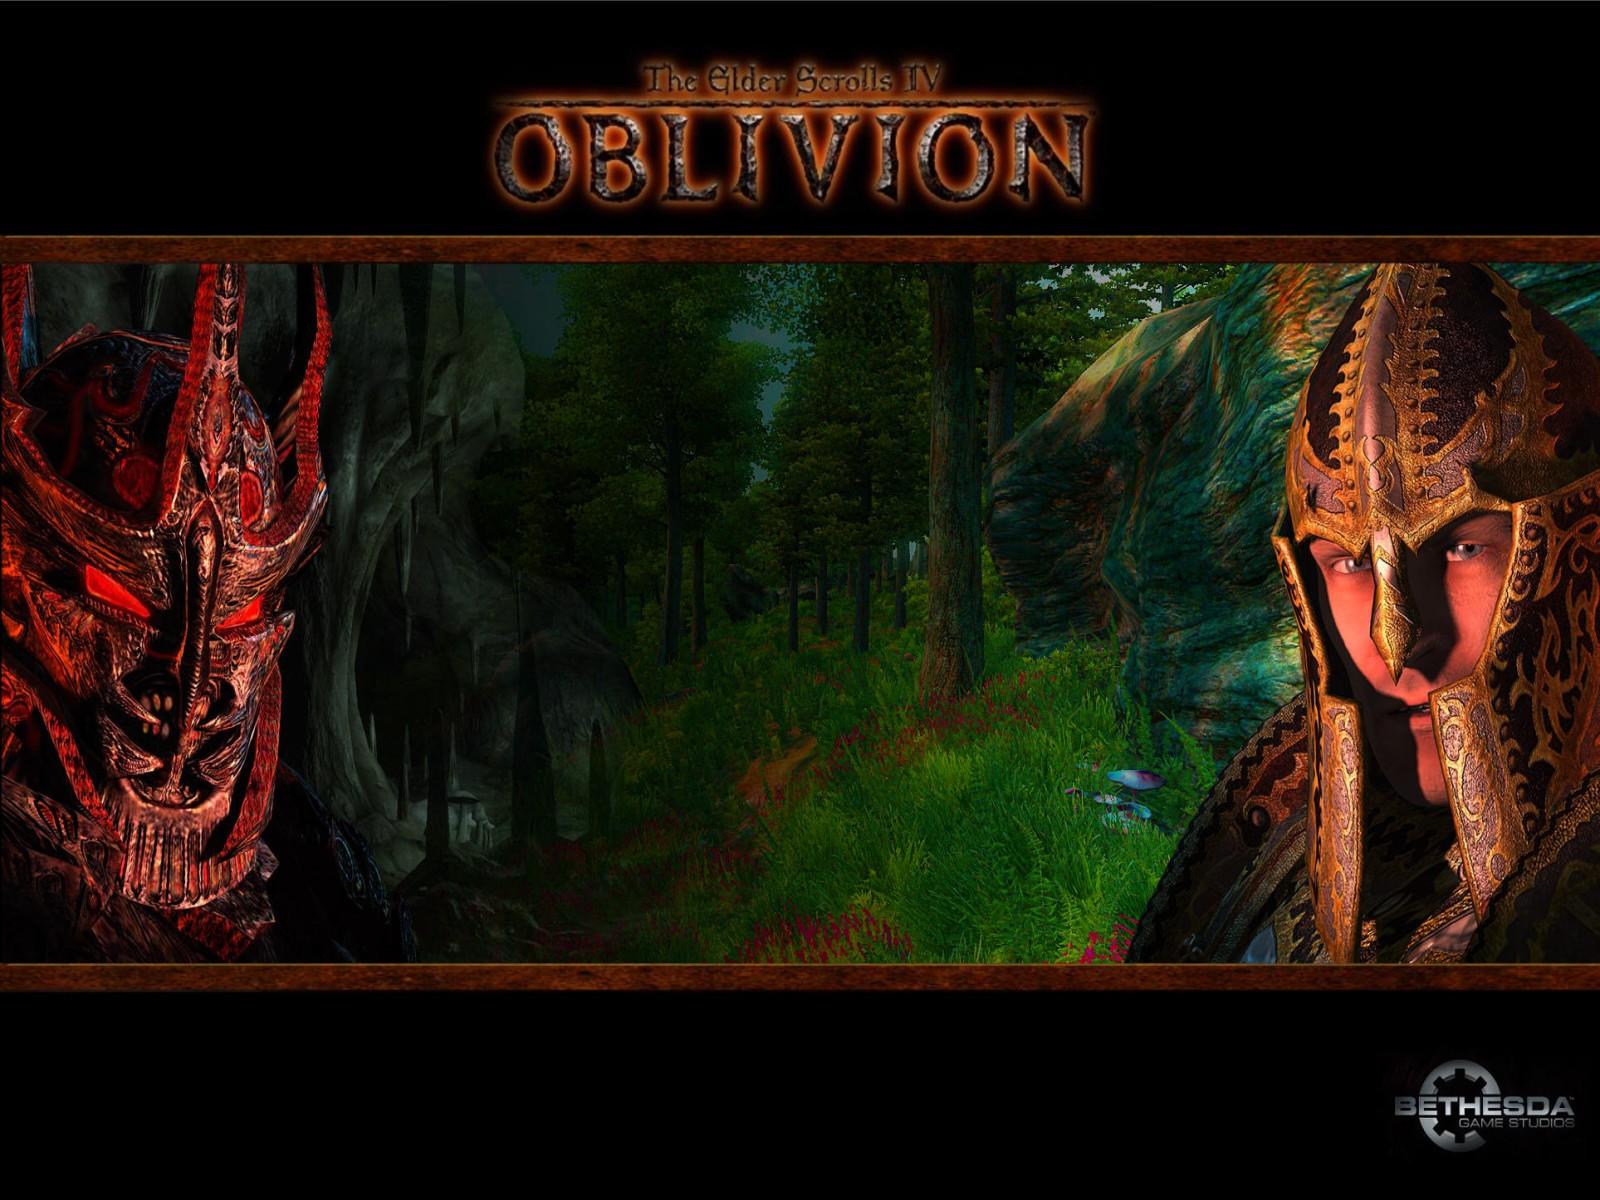 http://planetoblivion.de/Downloads/usersubmitted/oblivion_wpjodop1600.jpg